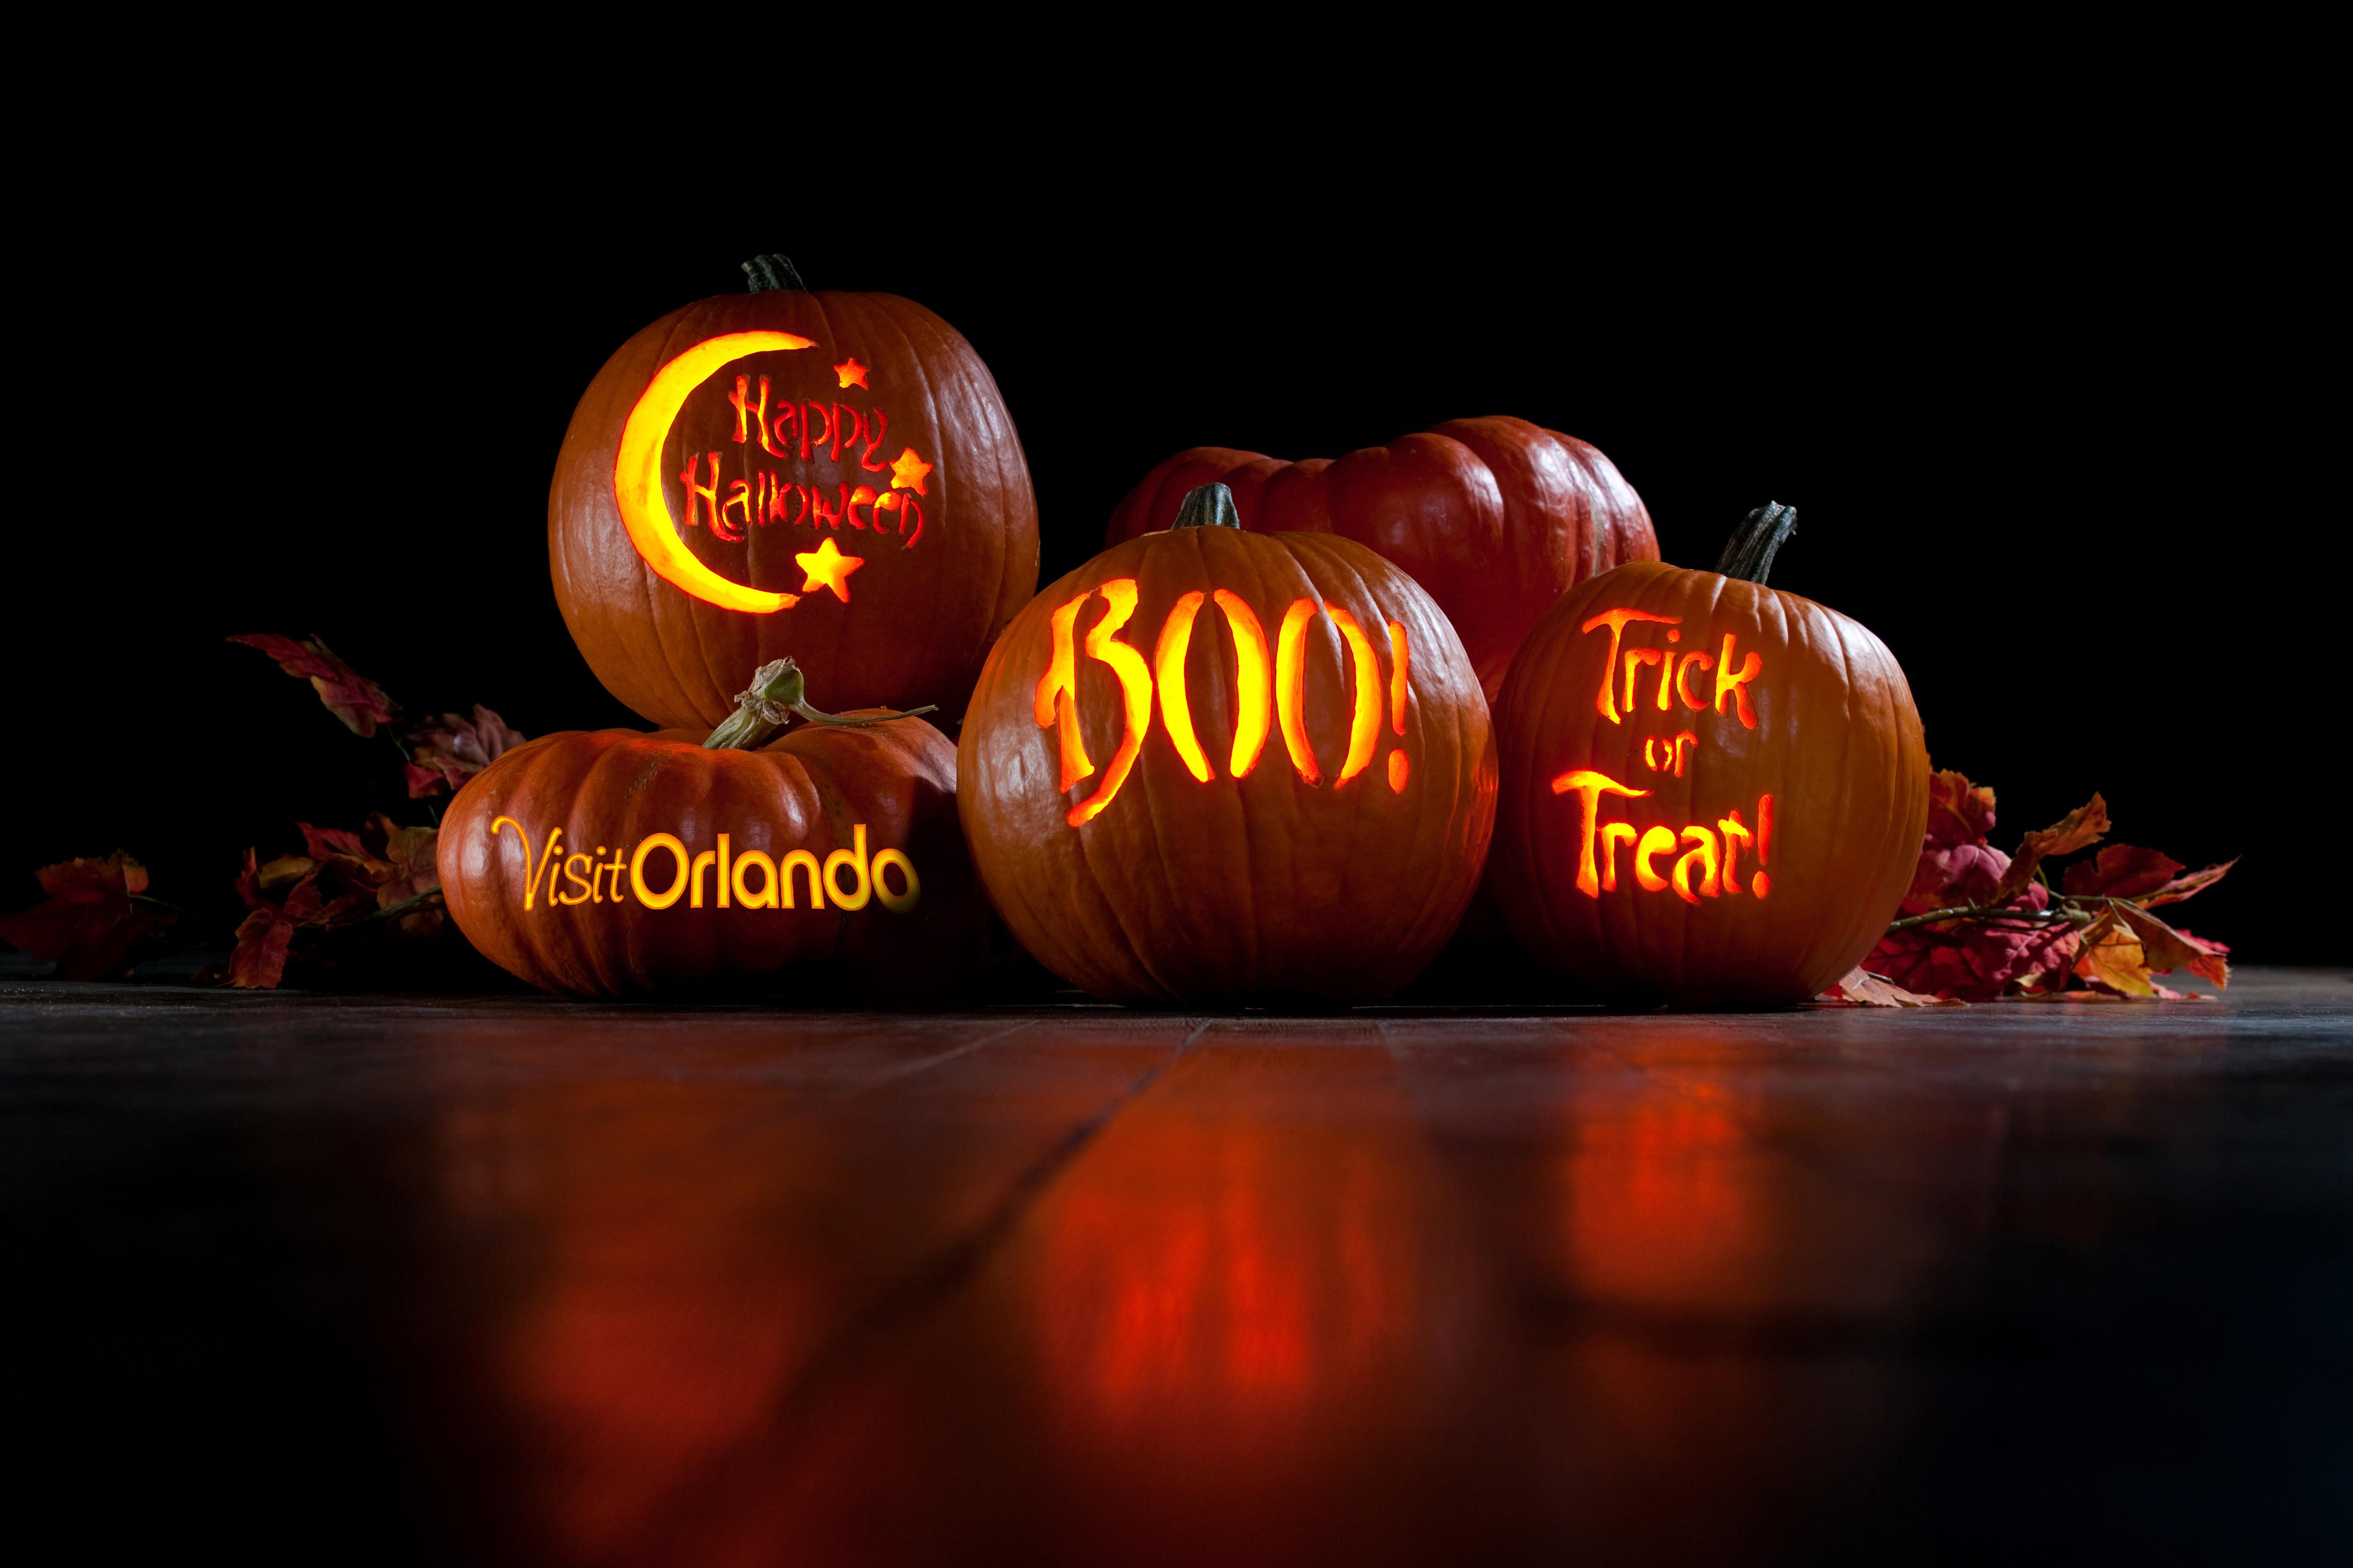 Orlando: Halloween Vacation Capital